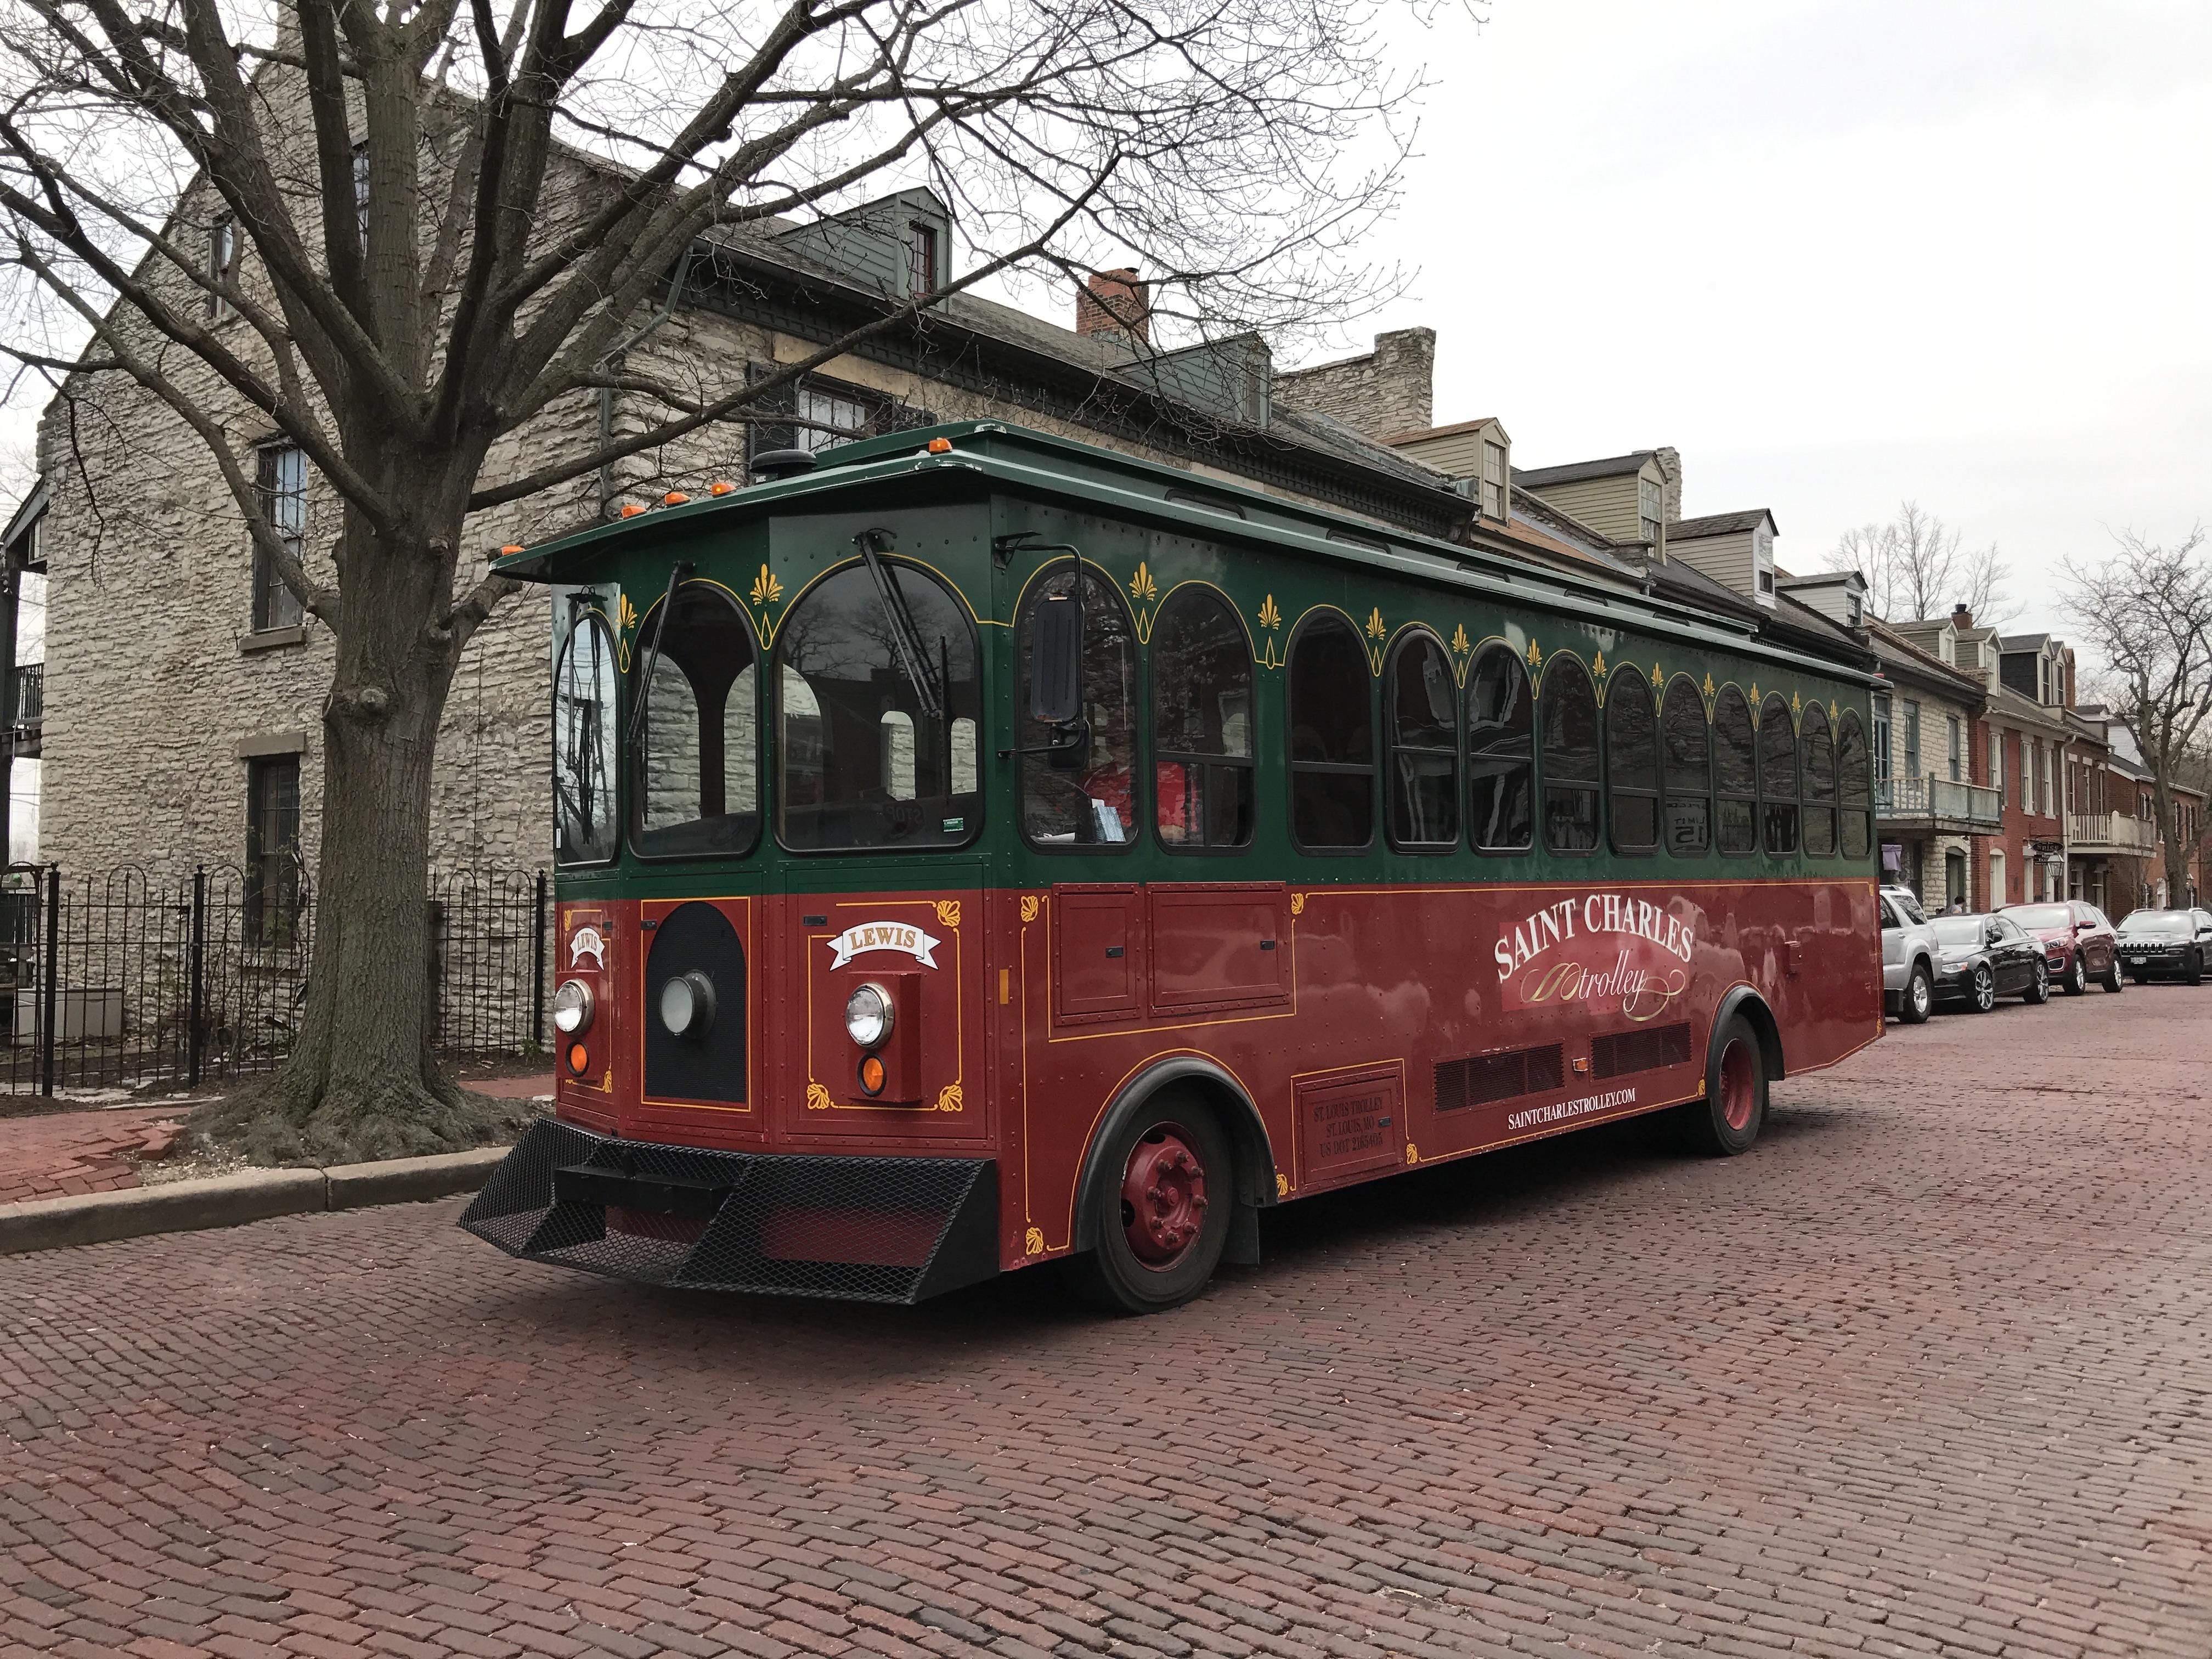 St Charles Main St Christmas, 2020 Historic Downtown Restaurants & Shopping   Saint Charles, MO